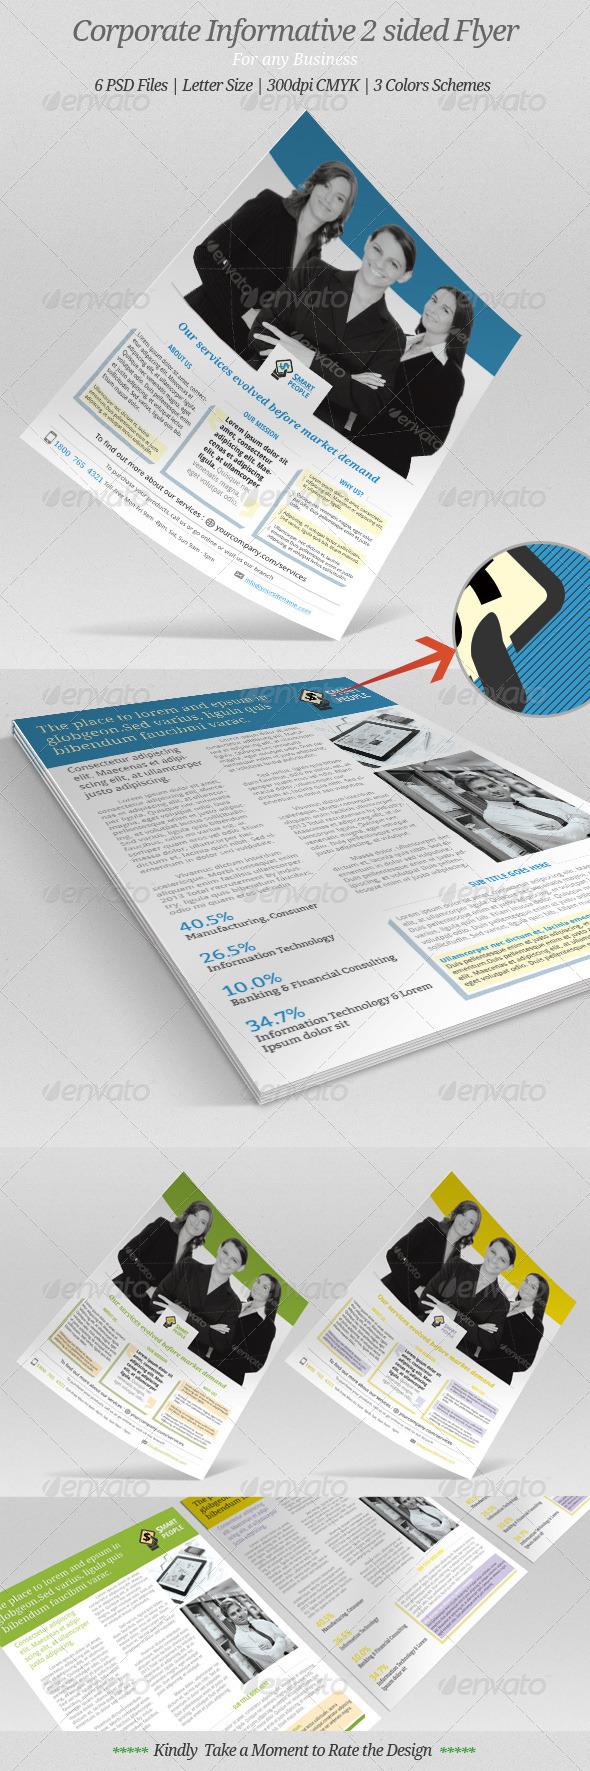 GraphicRiver Corporate Informative Flyer 7437440